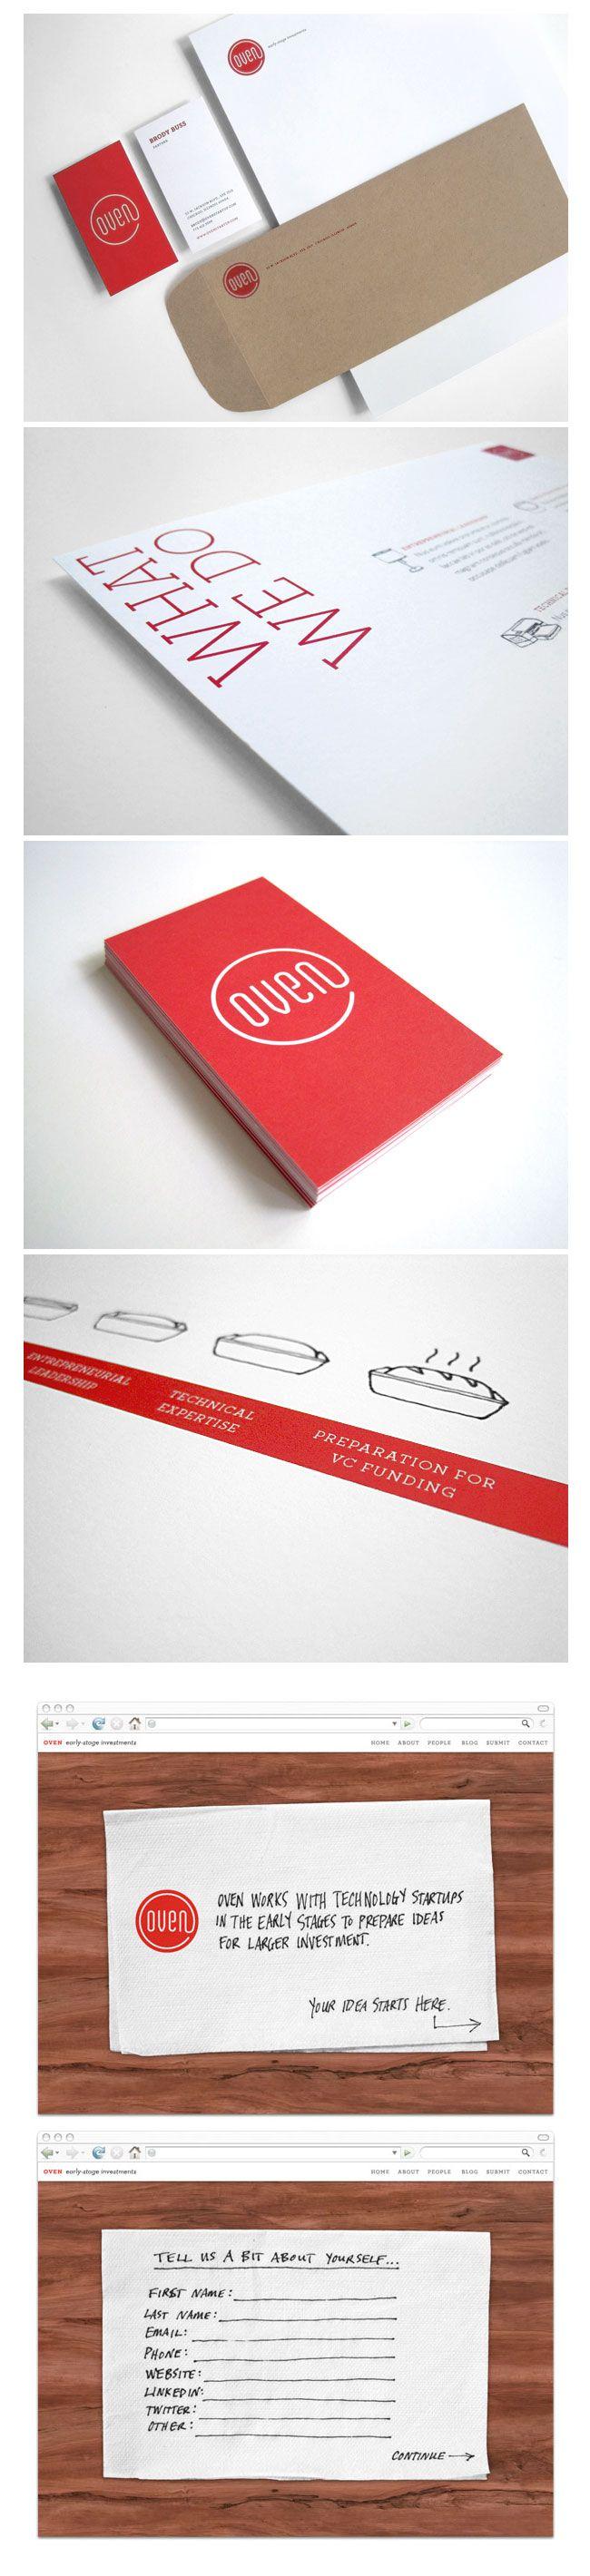 branding #design #corporate #identity #branding #visual